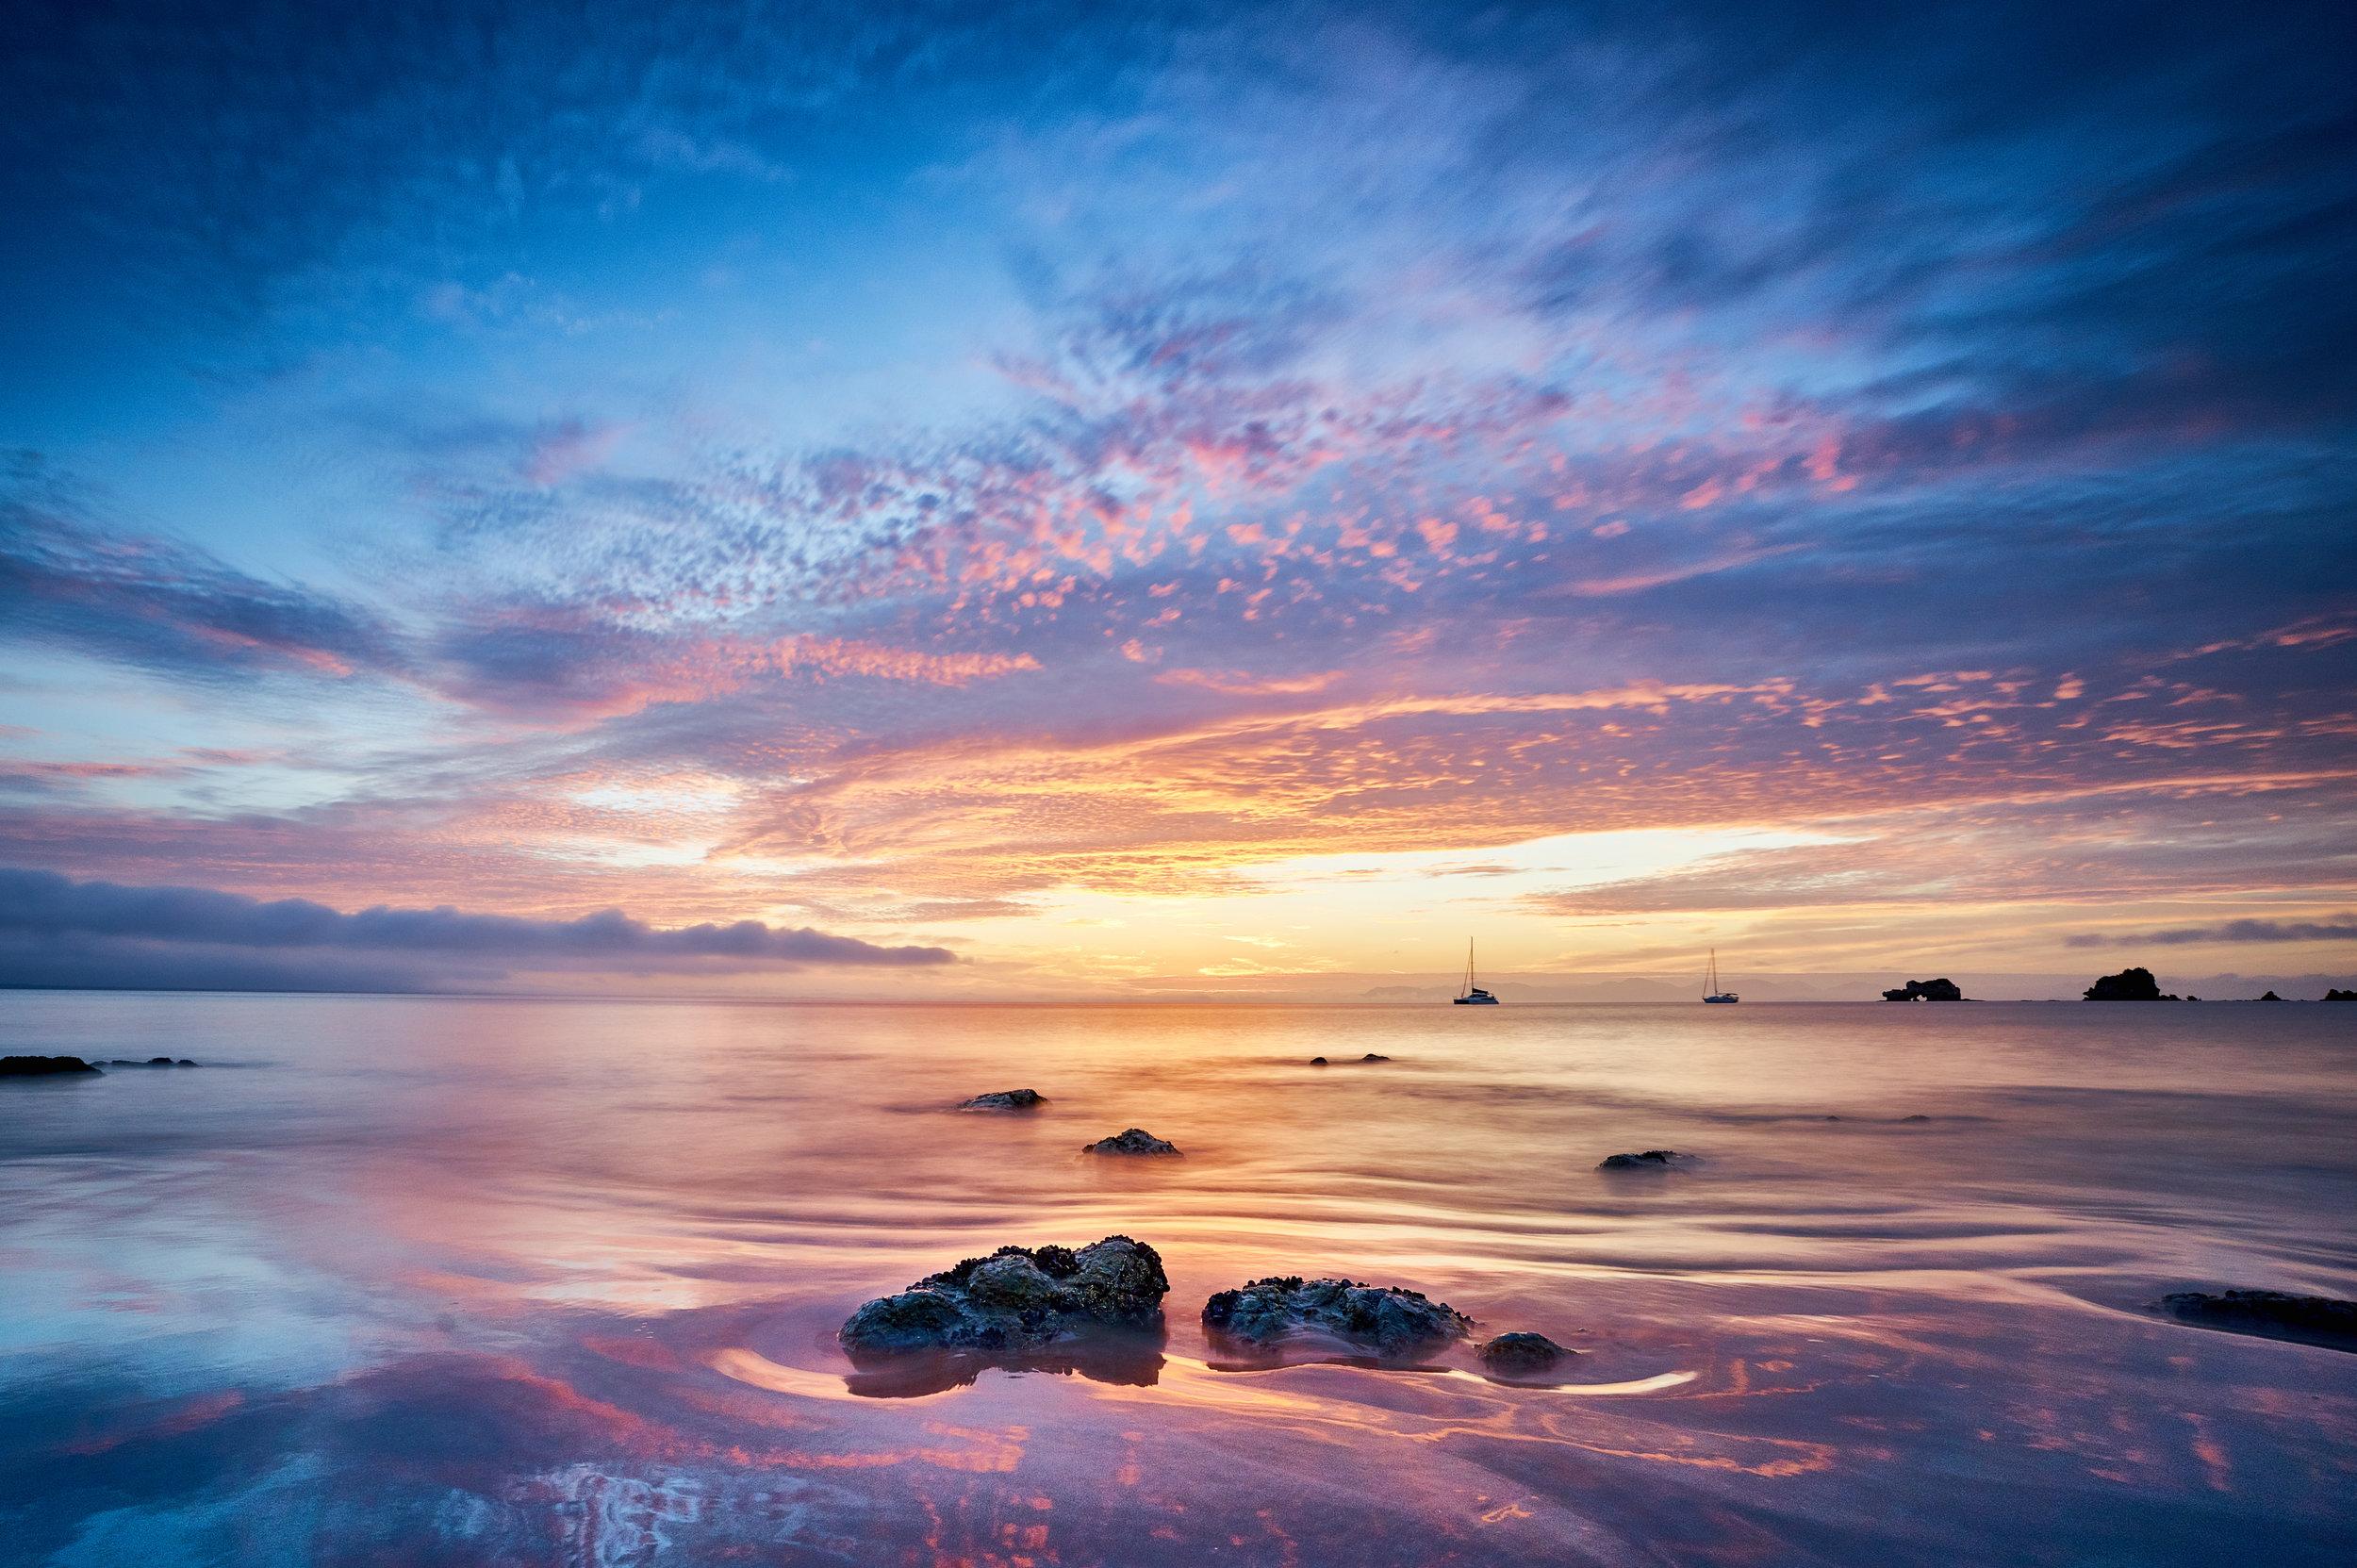 Waratah Bay at dawn